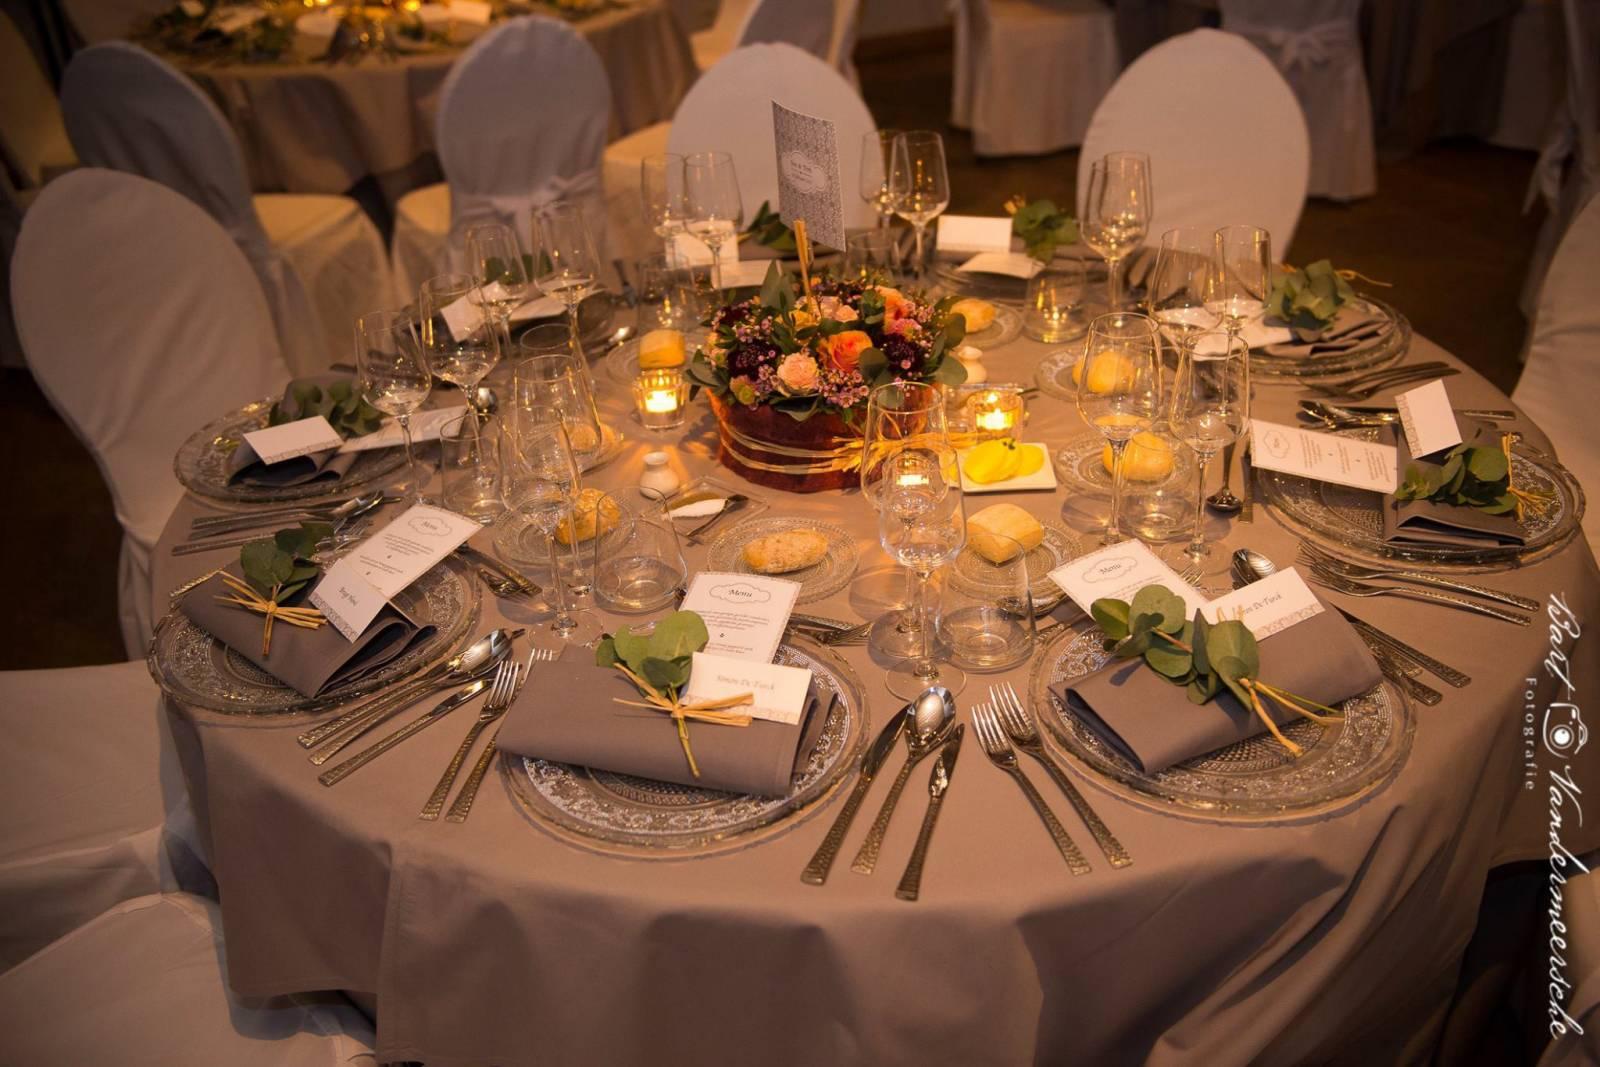 Excellence Weddings - House of Weddings - Photo4You3